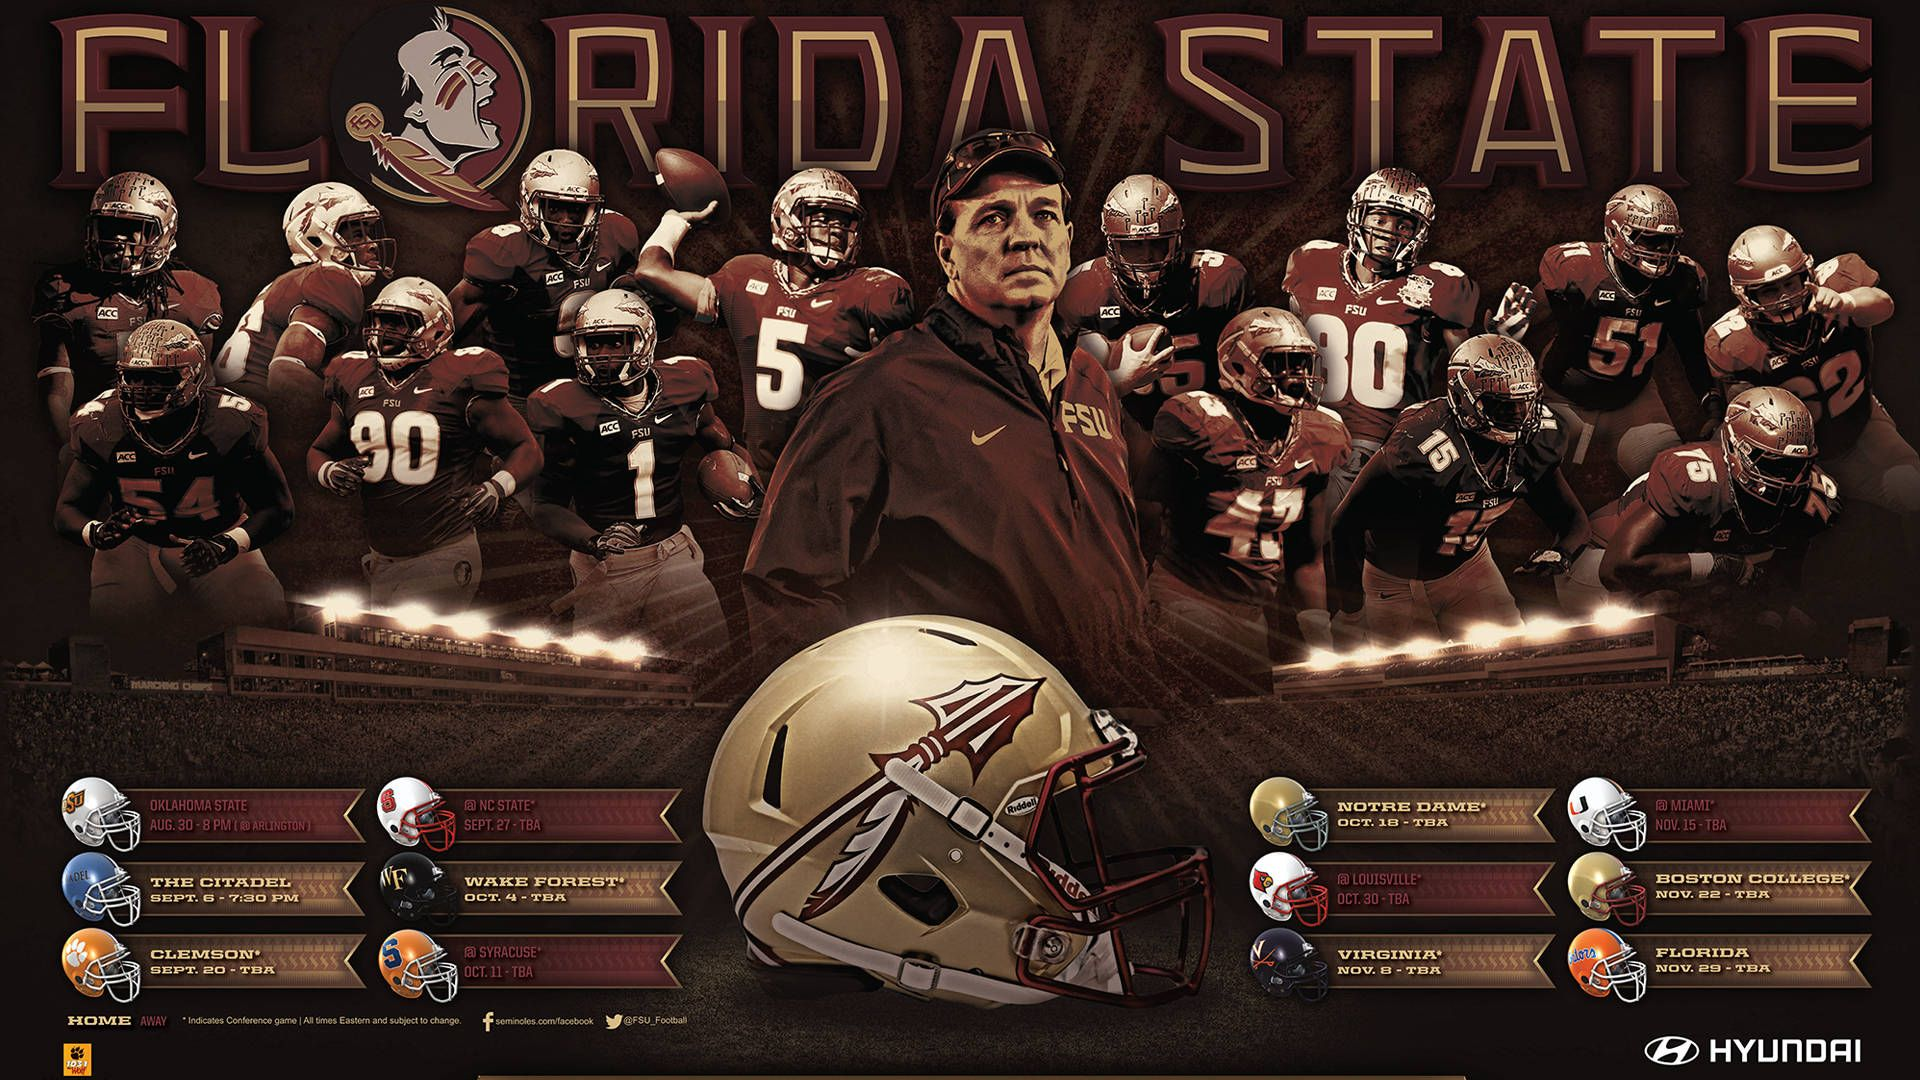 Pin By Tim Russ On Seminole Florida State Football Football Wallpaper Fsu Football